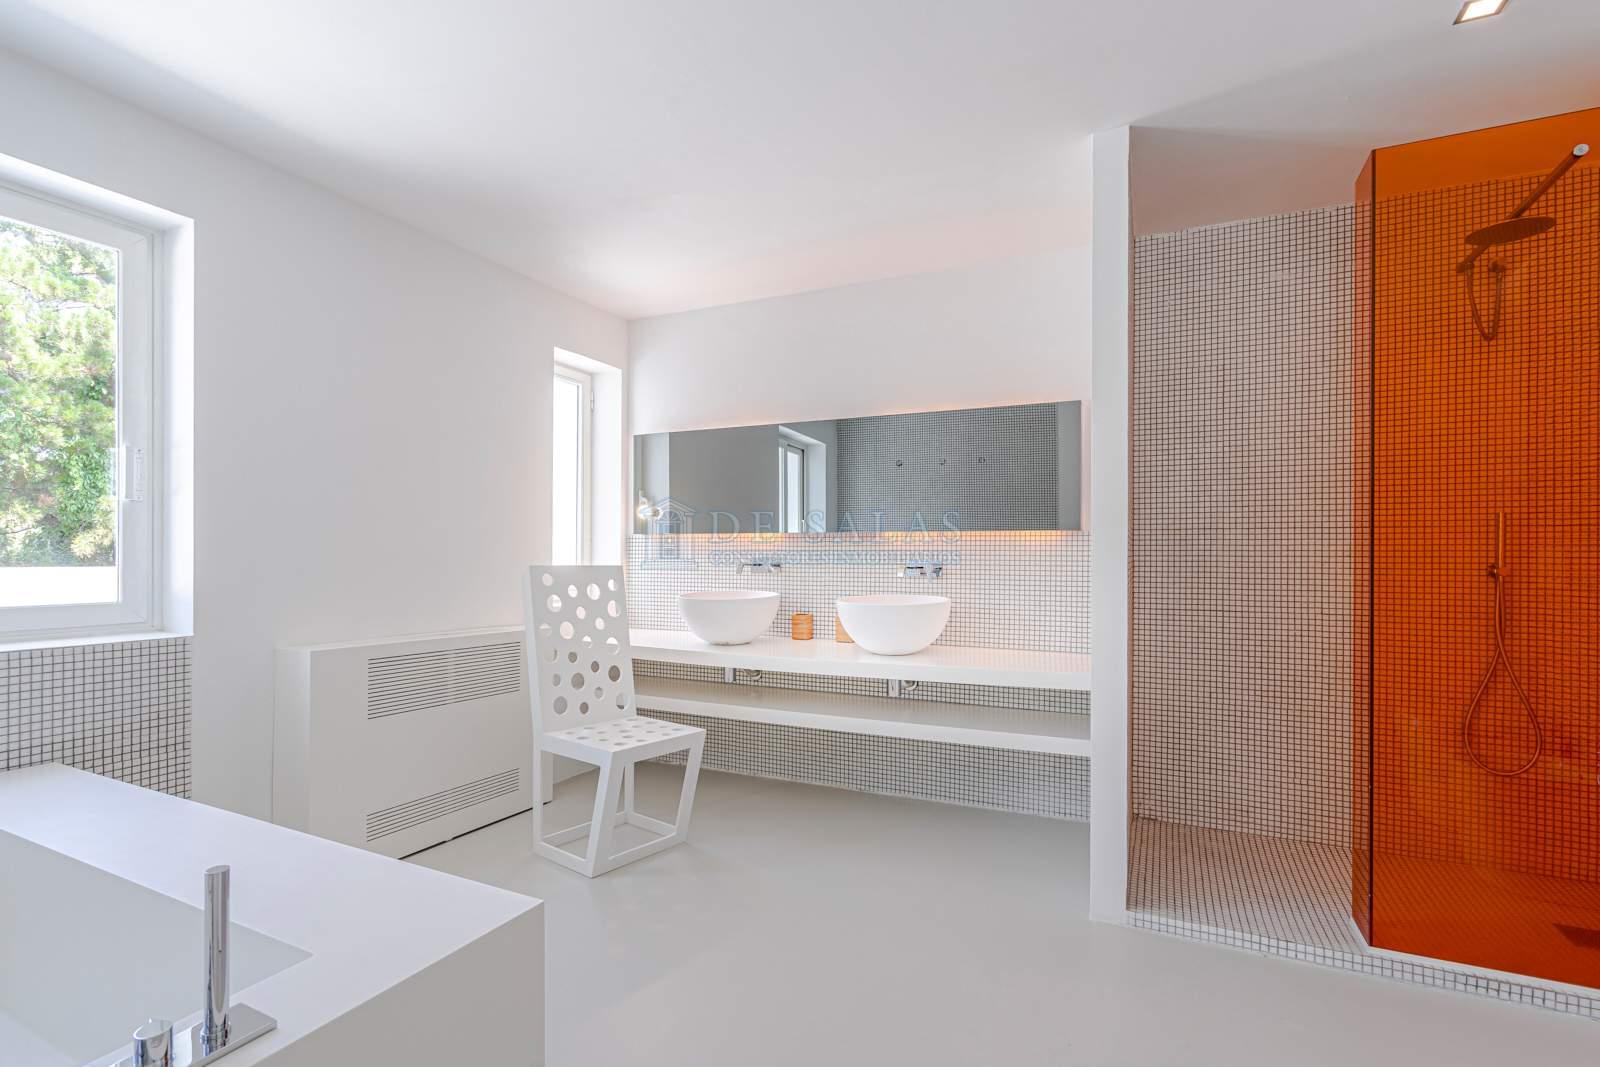 Baño-0025 House La Moraleja